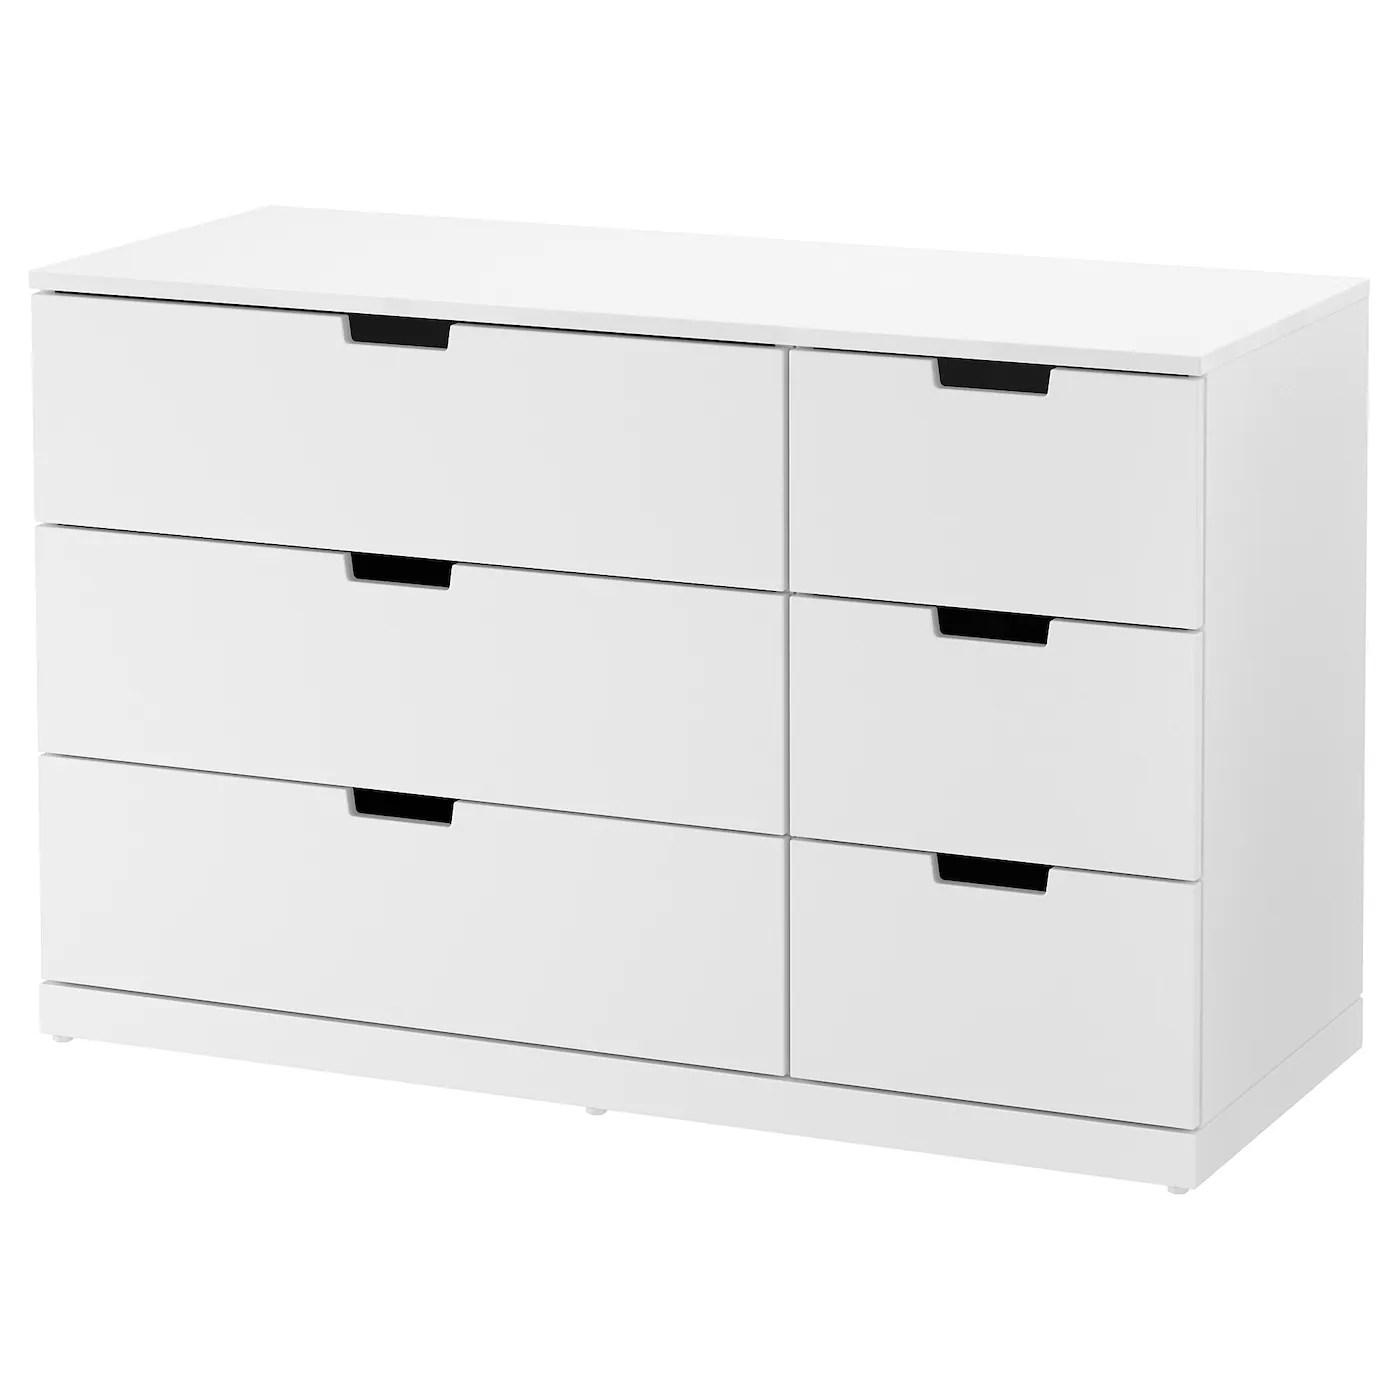 nordli commode 6 tiroirs blanc 120x76 cm